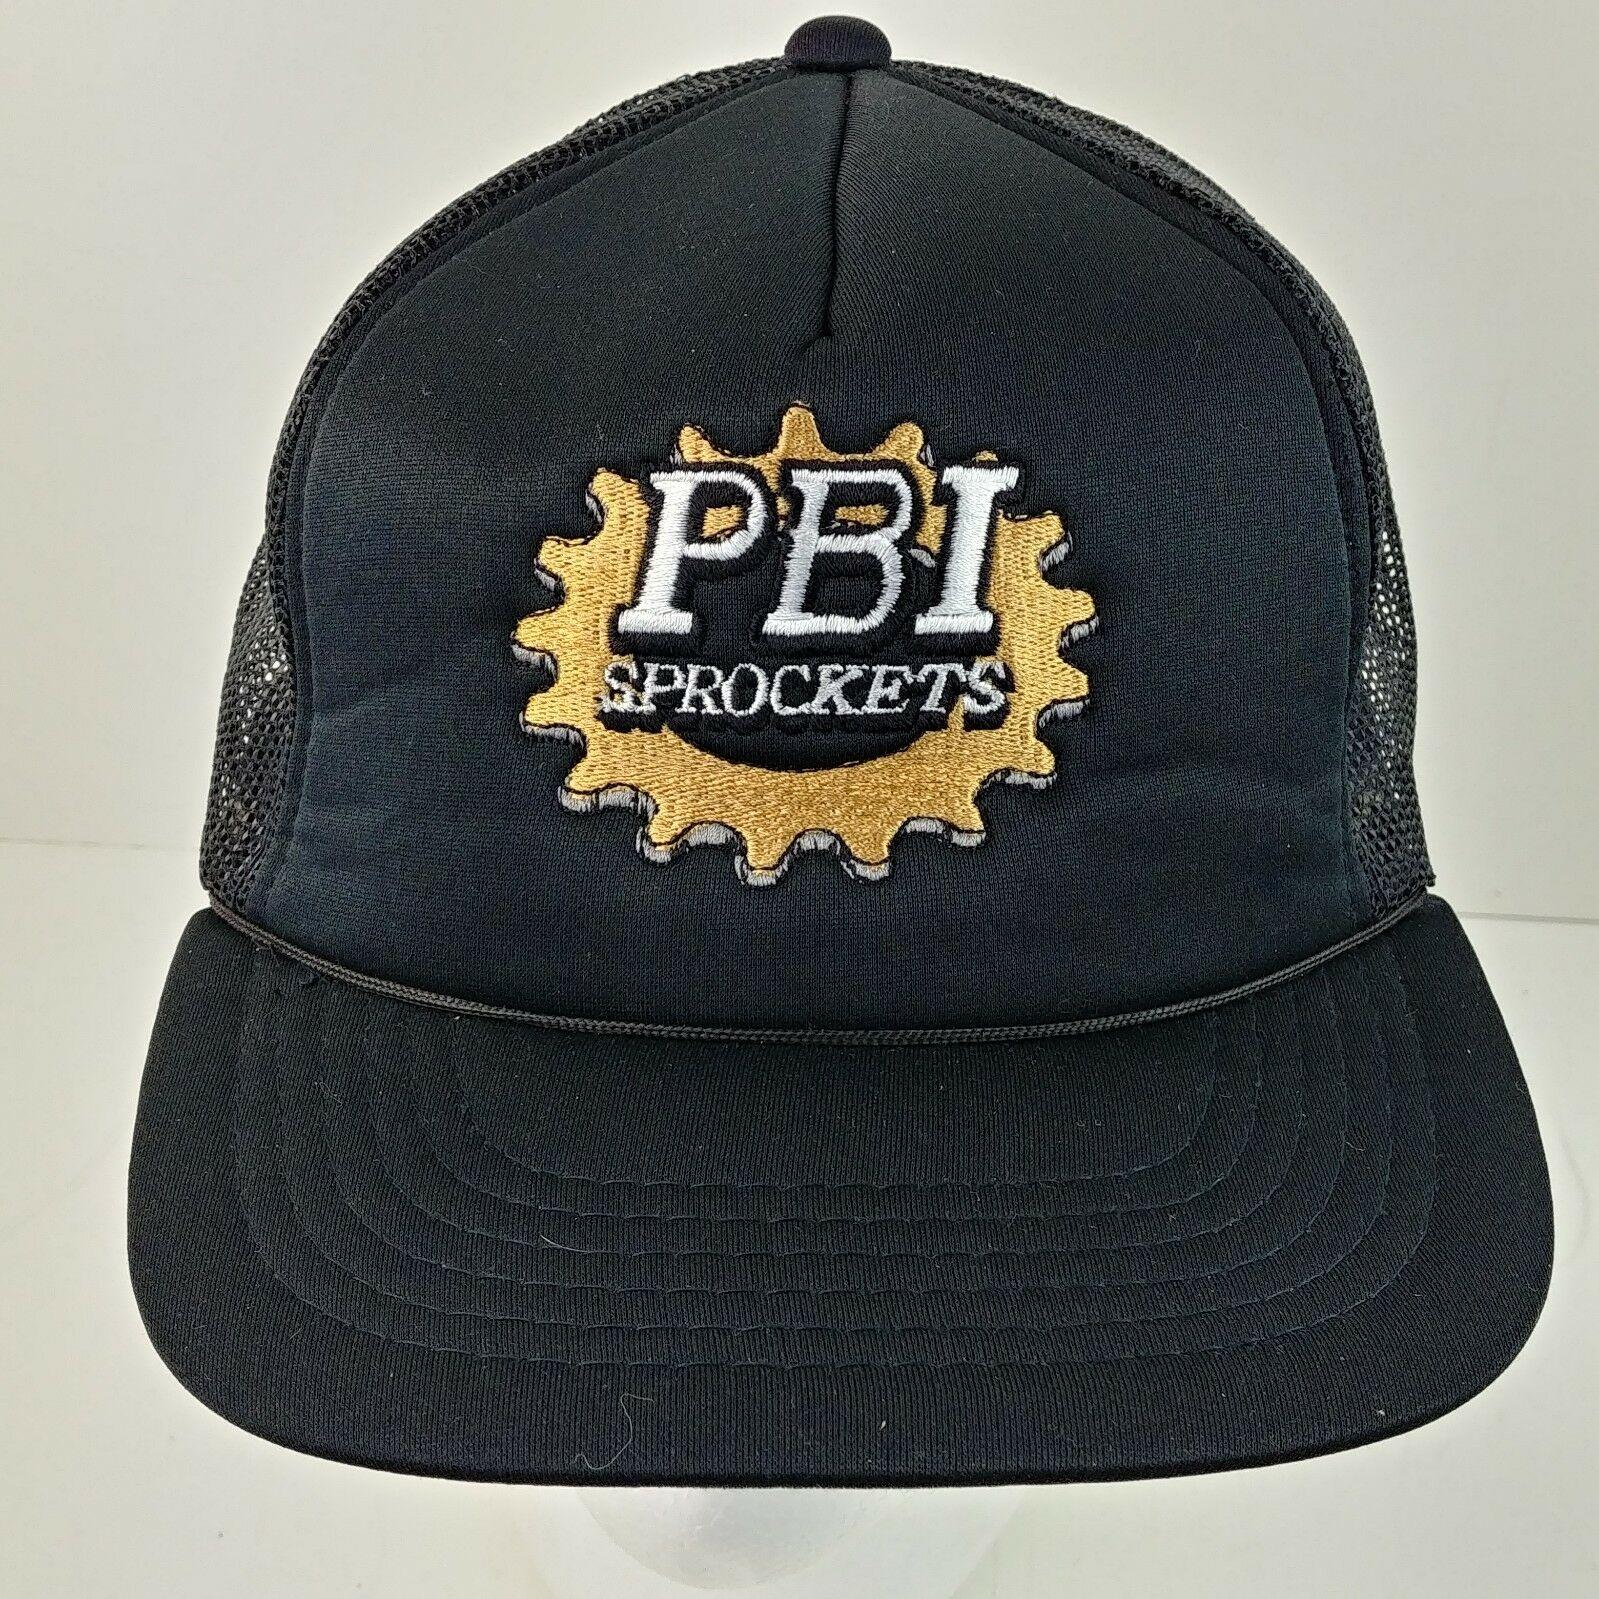 5bd8f05b564 PBI Sprockets Motorcycle Parts Racing Baseball Cap Hat Snapback Trucker –   14